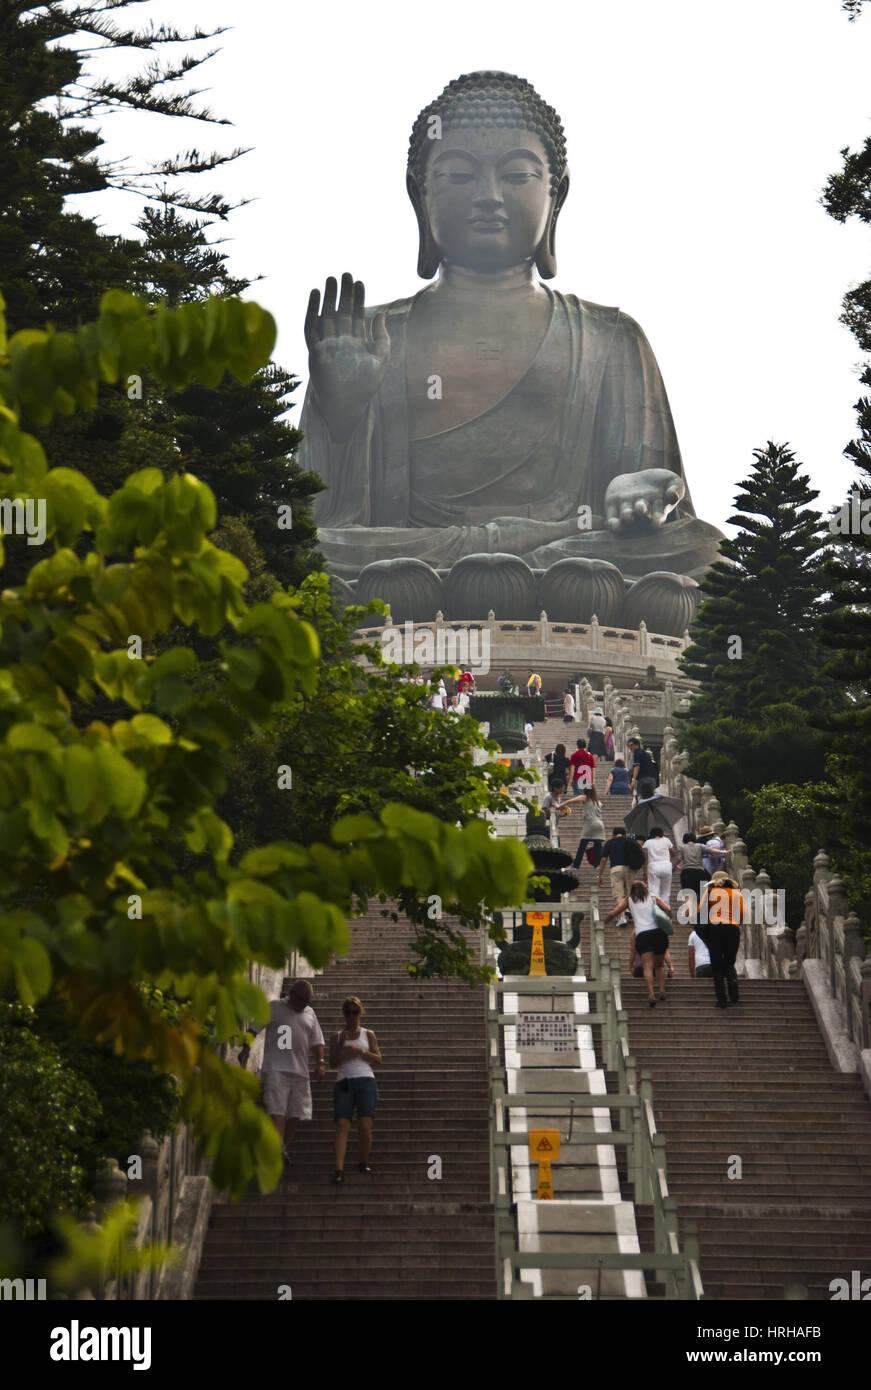 Tian Tan Buddha, weltgroesste sitzende Buddhastatue auf Lantau Island, Hongkong, China - Tian Tan Buddha, Lantau - Stock Image